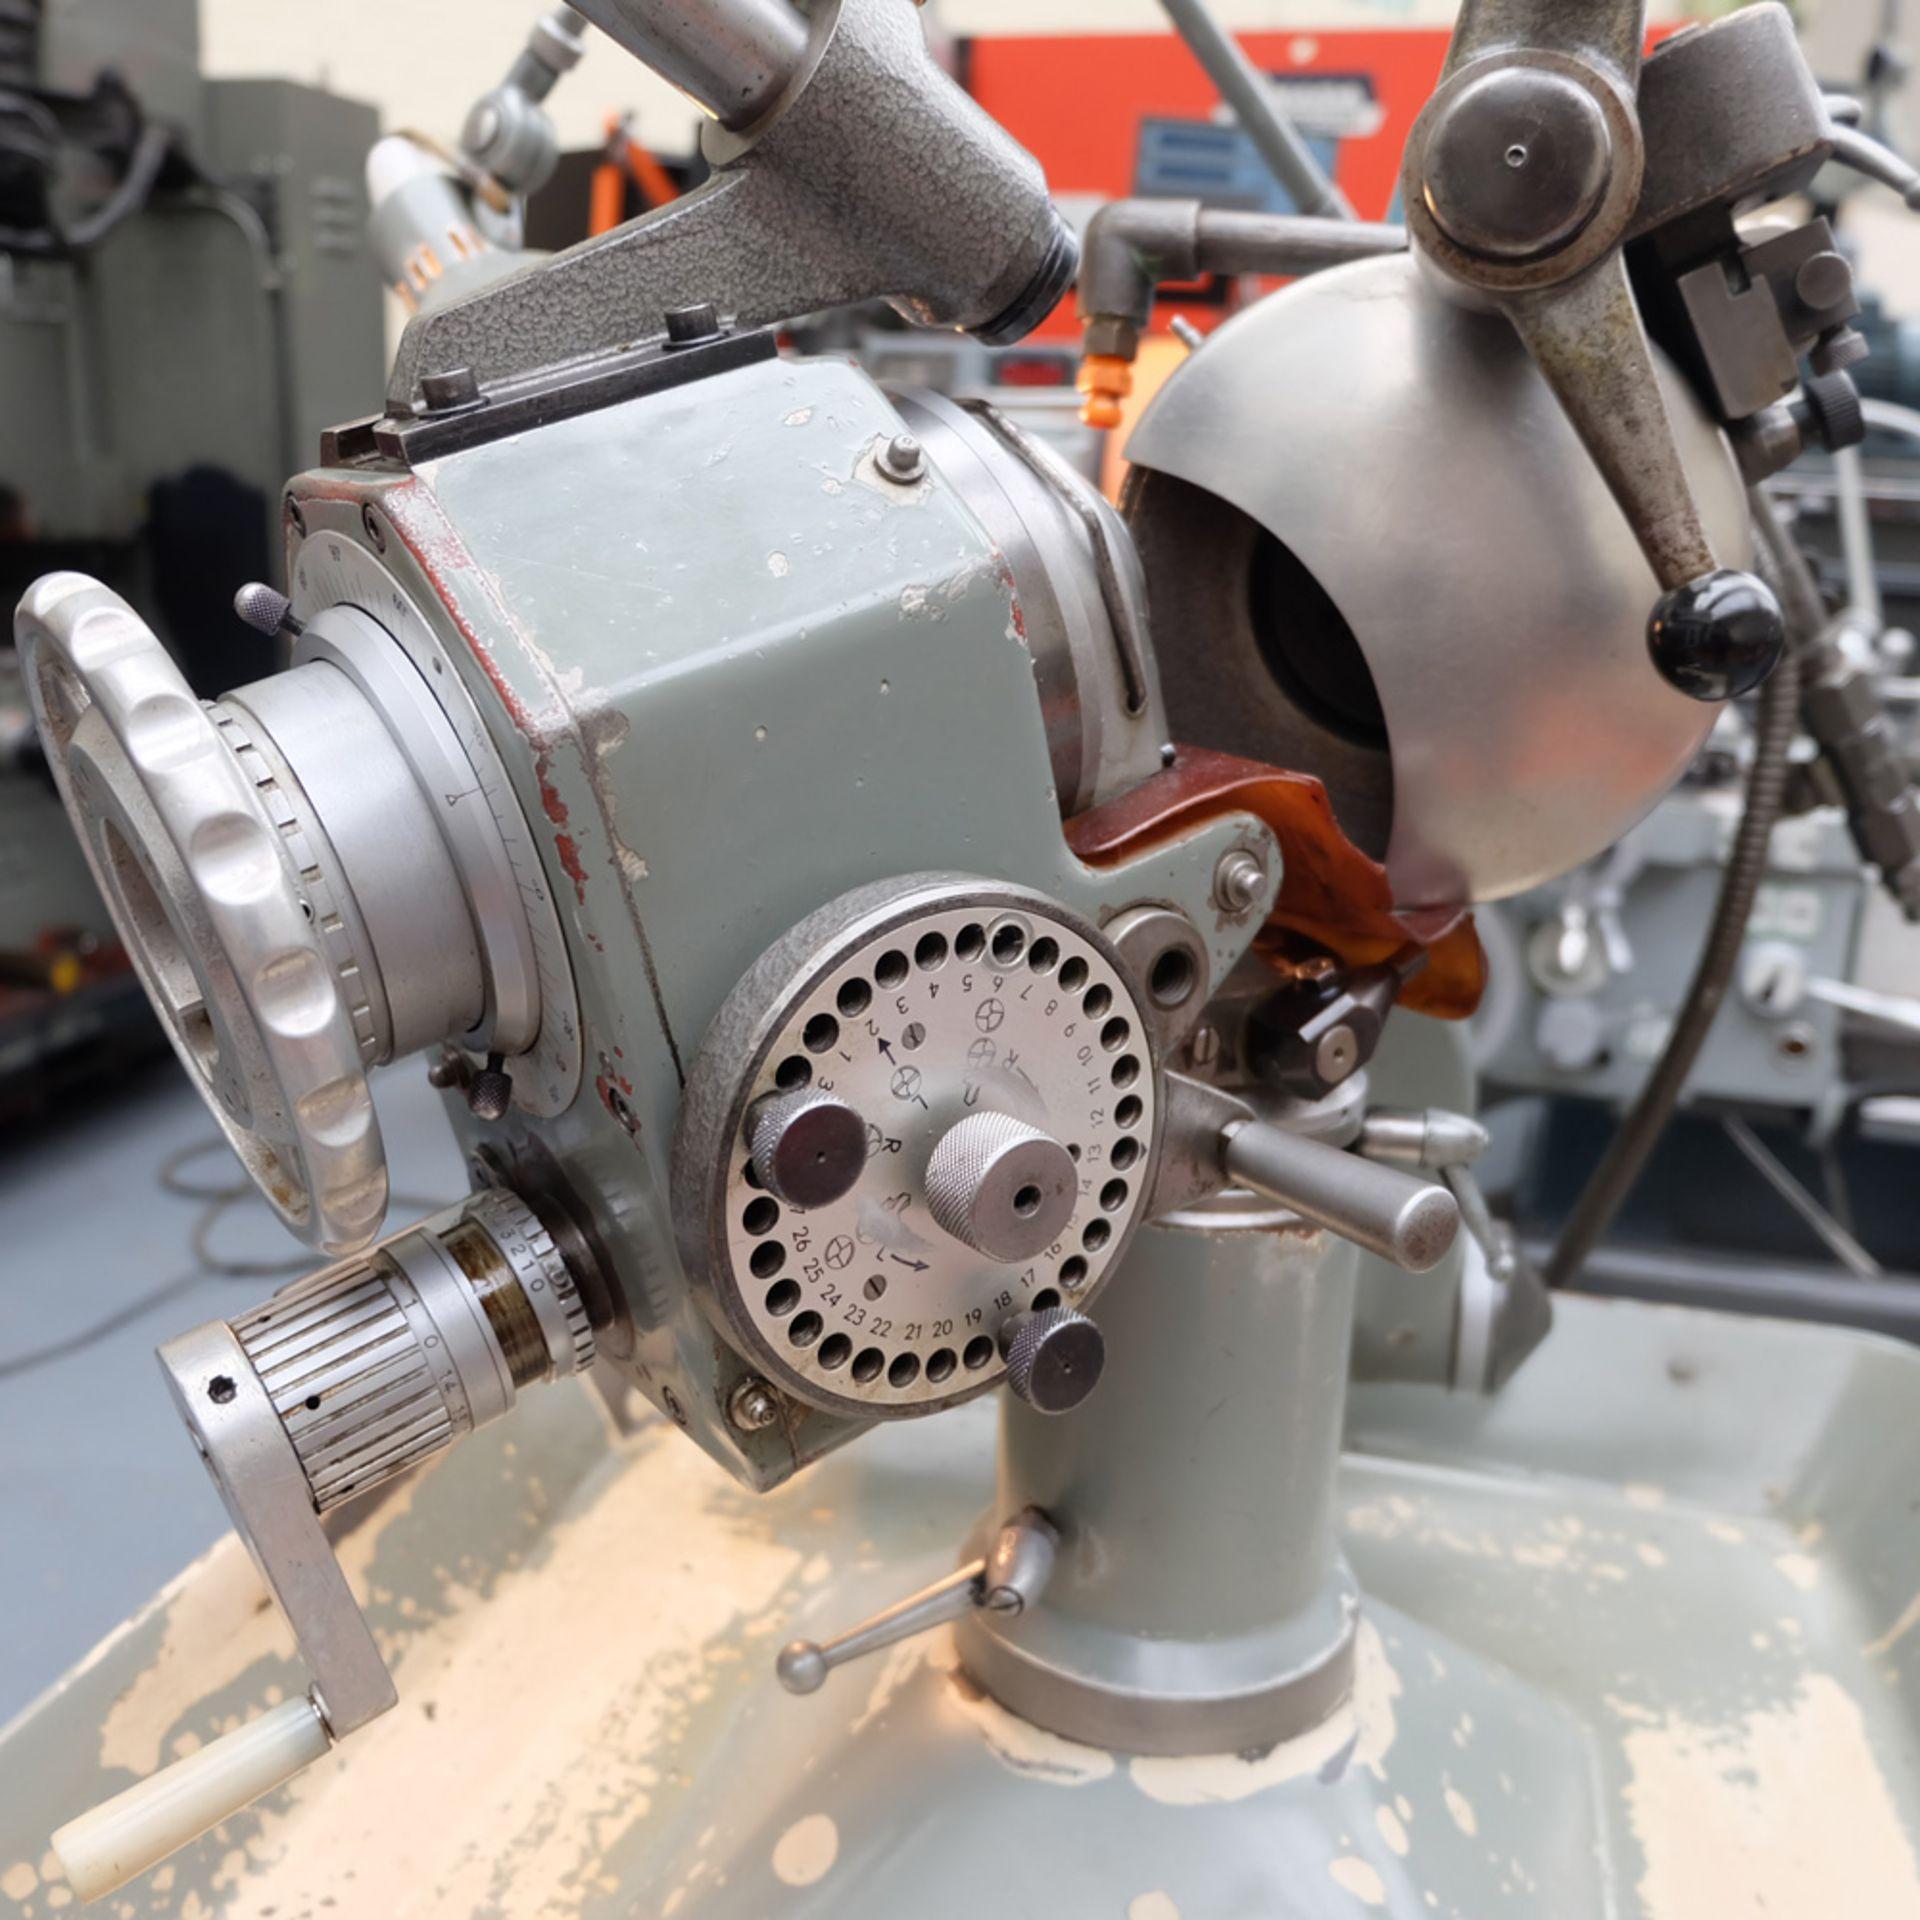 Christen Type 2-32 Twist Drill Grinding Machine. - Image 4 of 14